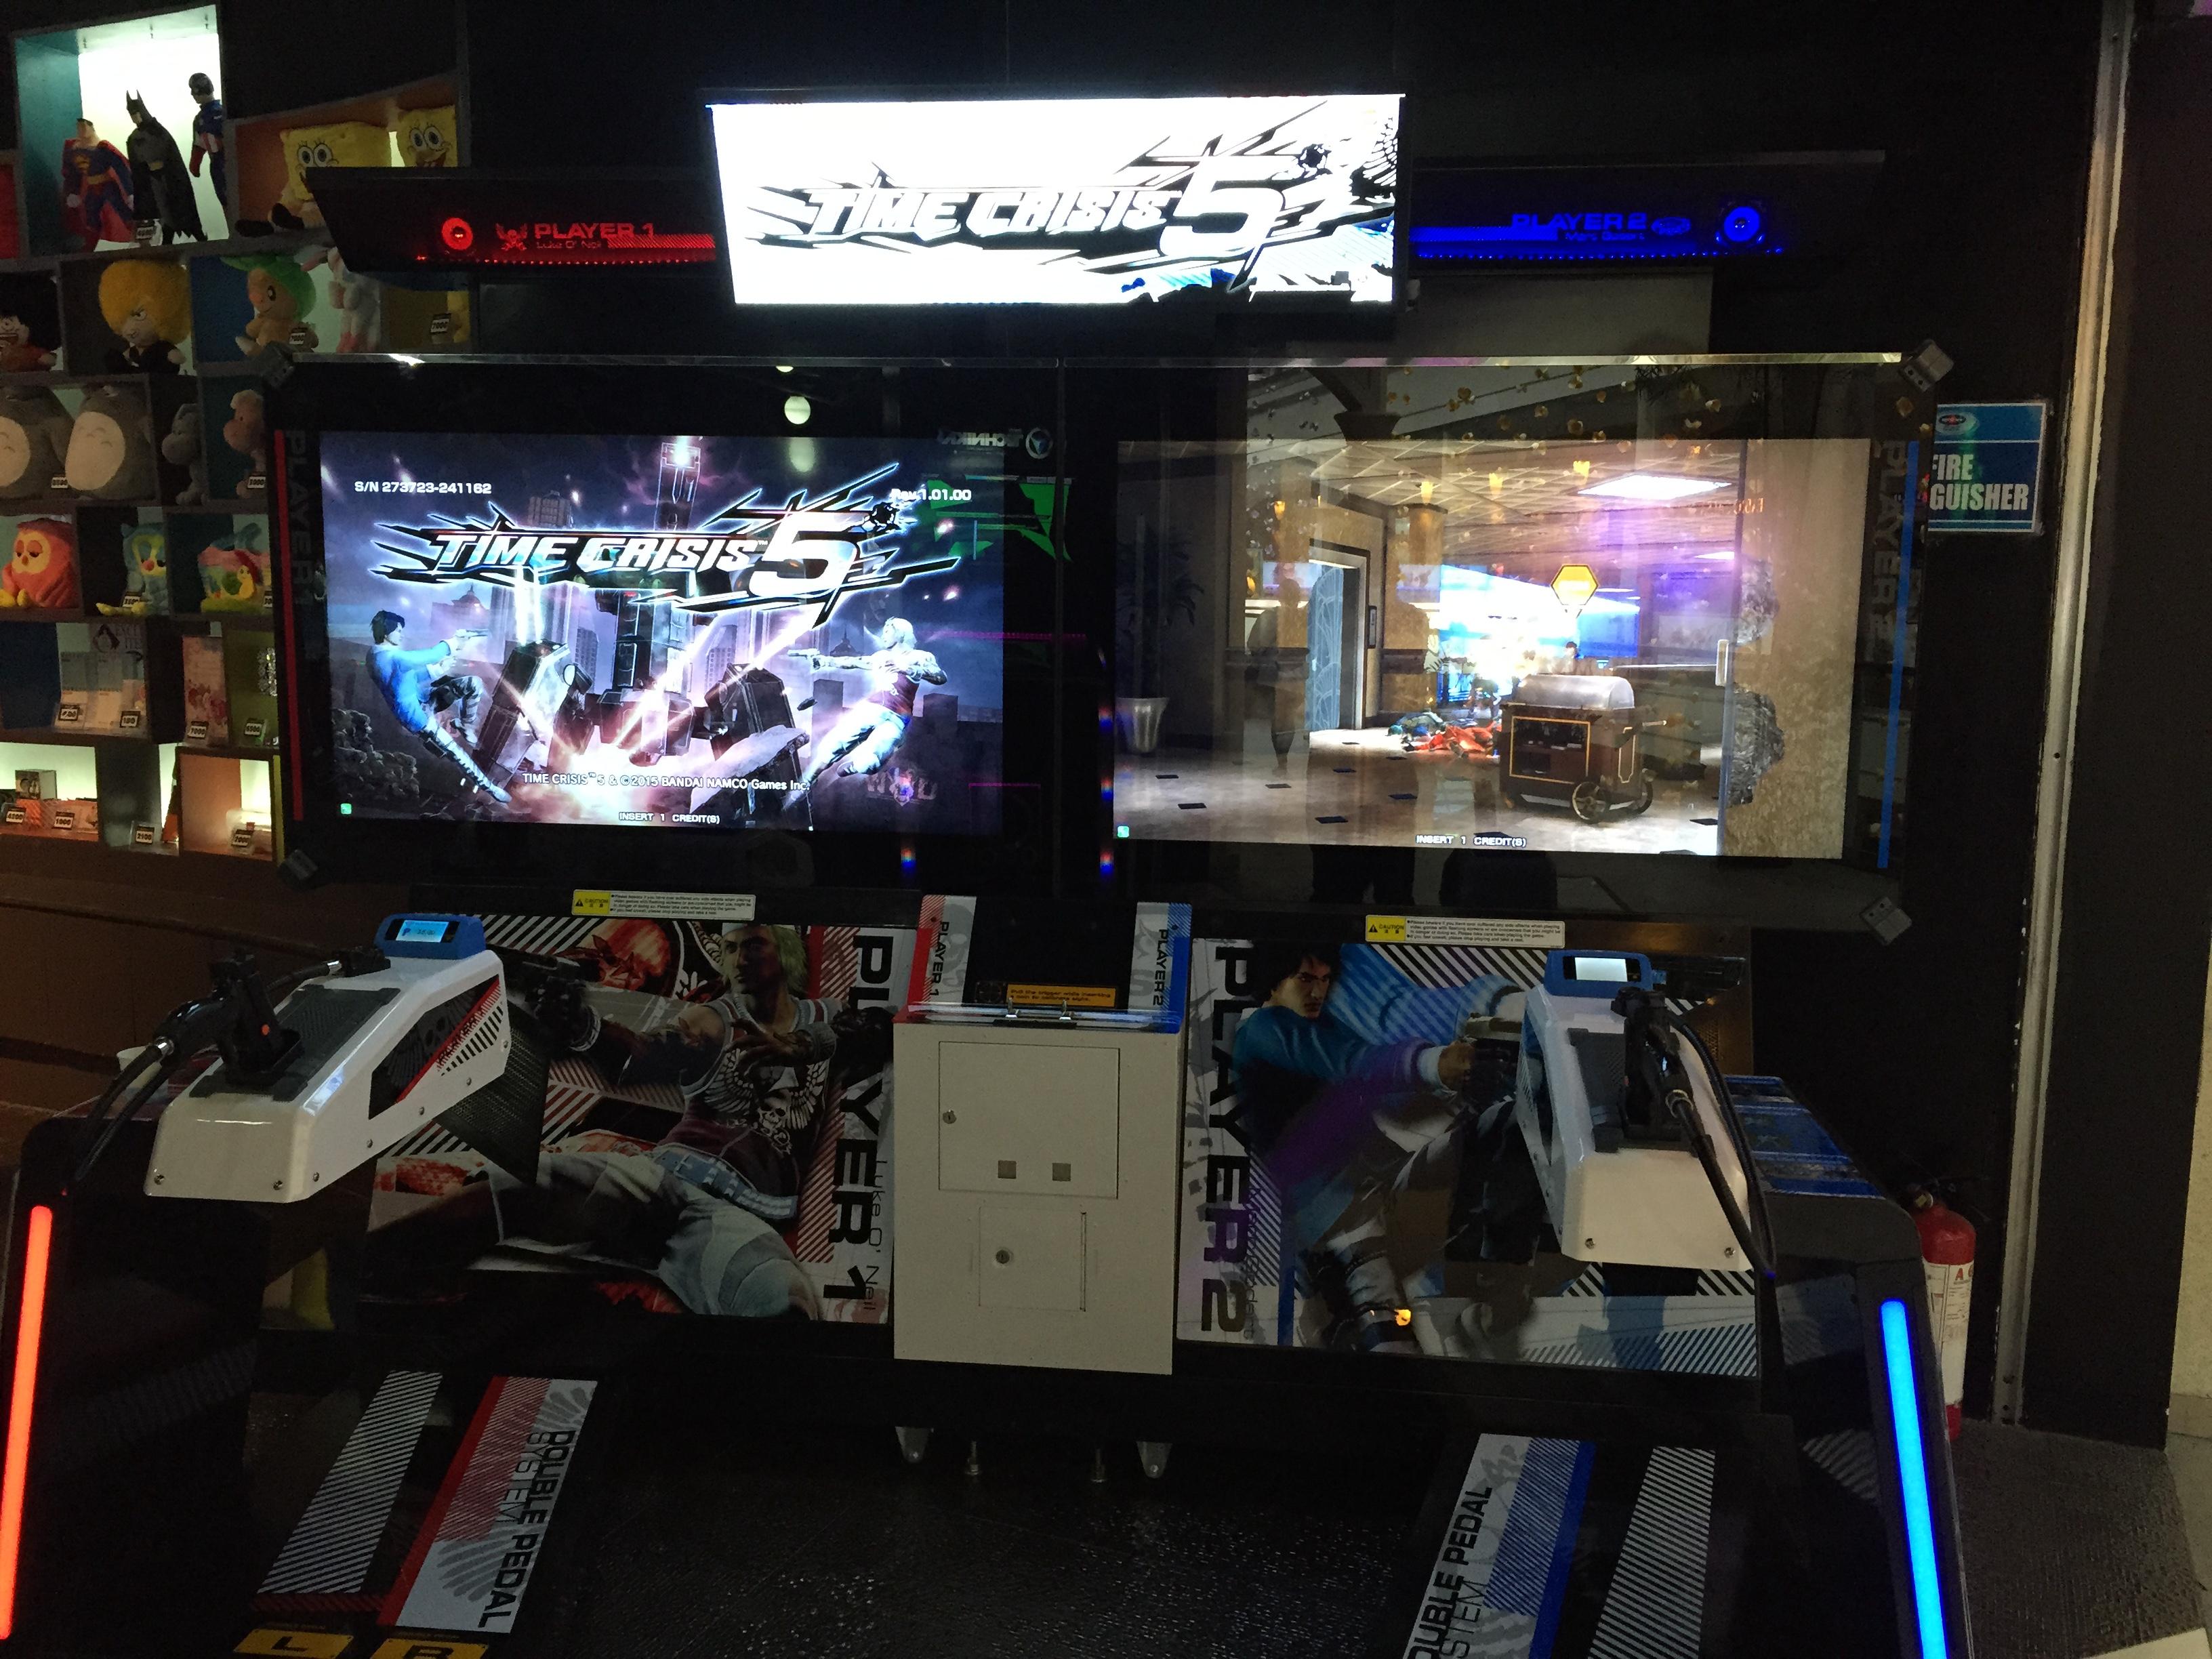 time crisis 5 arcade machine